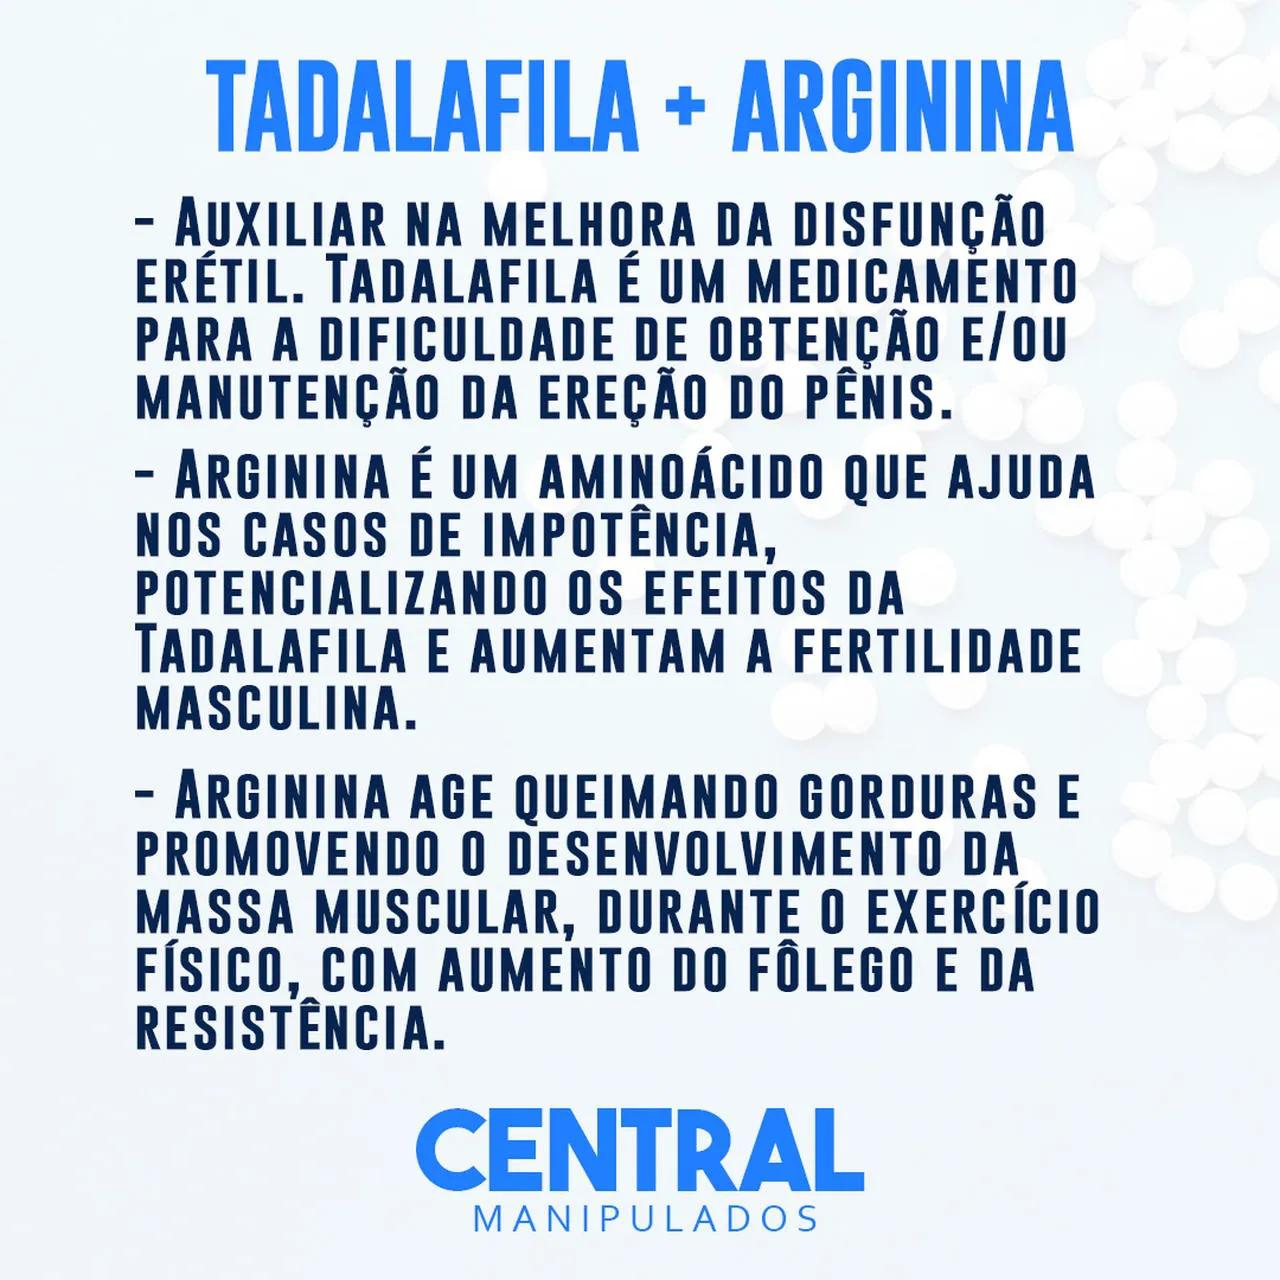 Tadalafila 10mg + Arginina 300mg - 120 capsulas